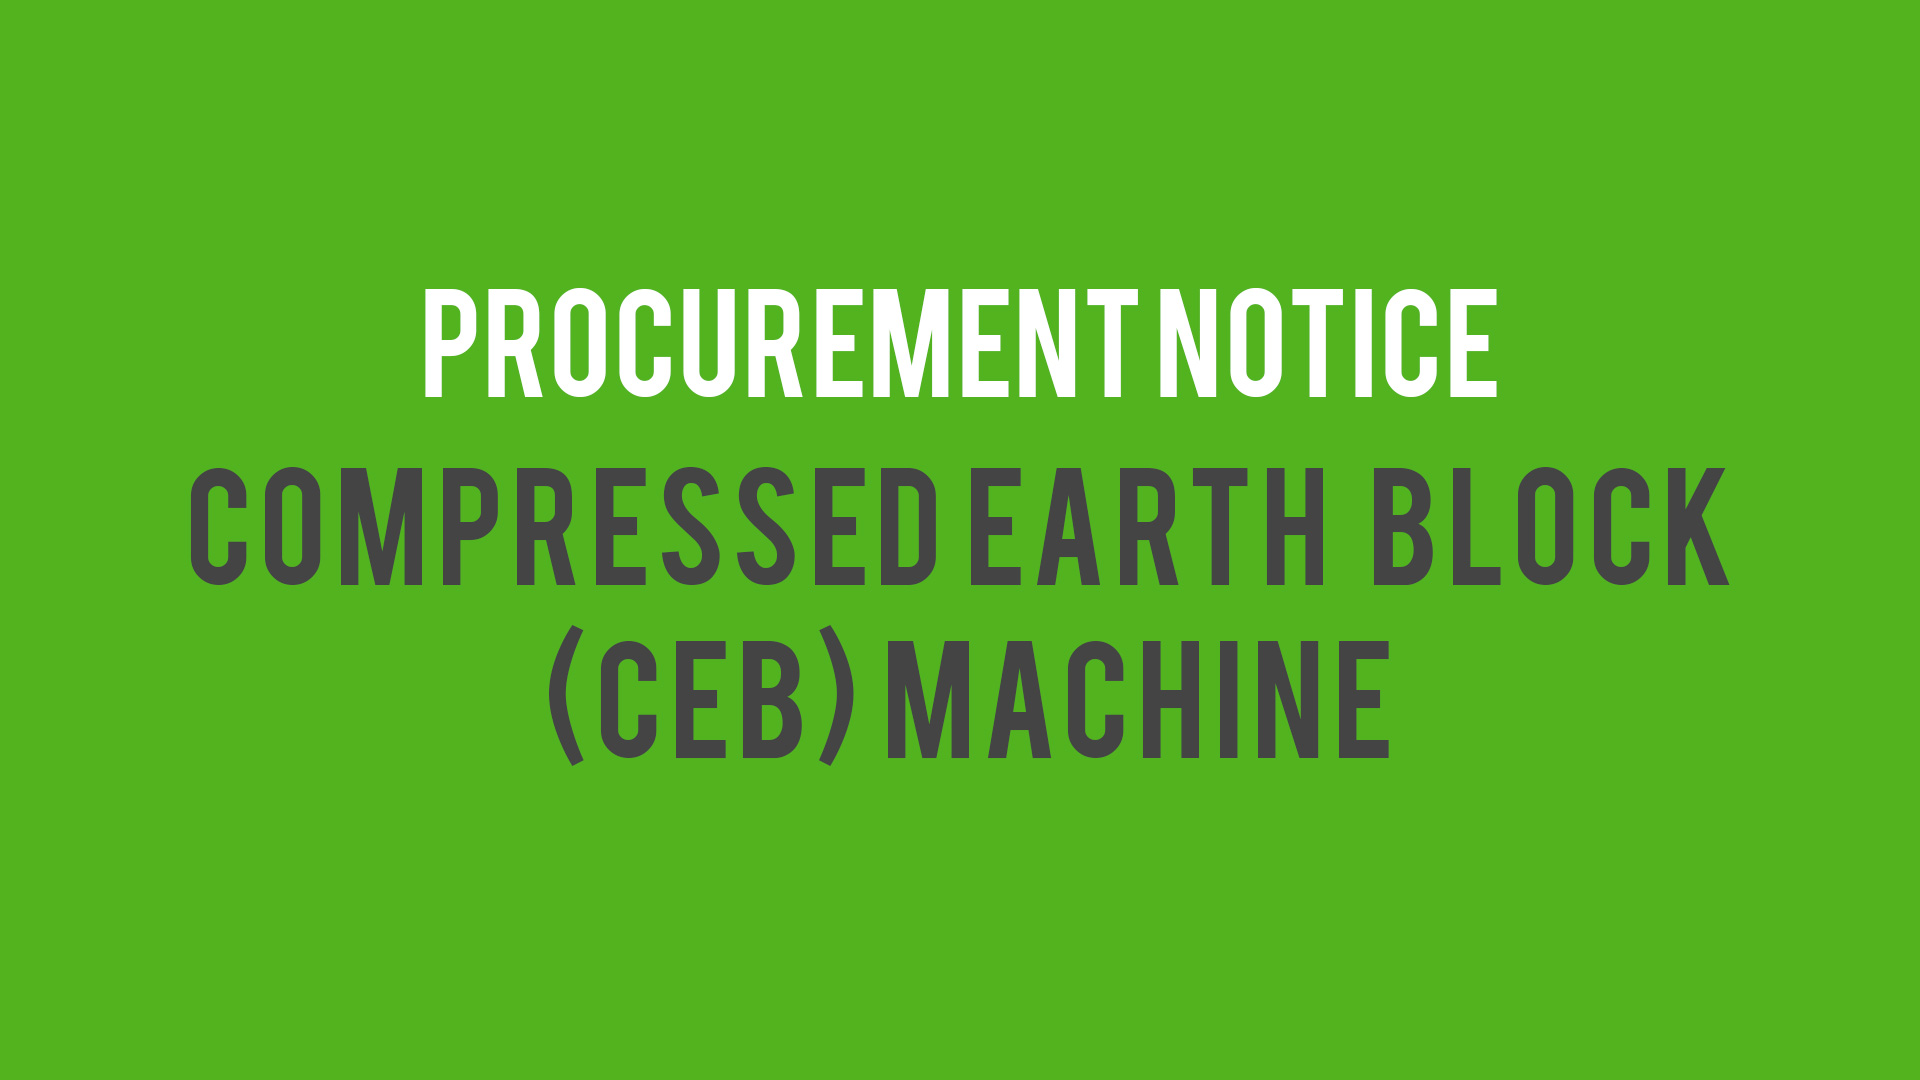 Required: Compressed Earth Block (CEB) Machine